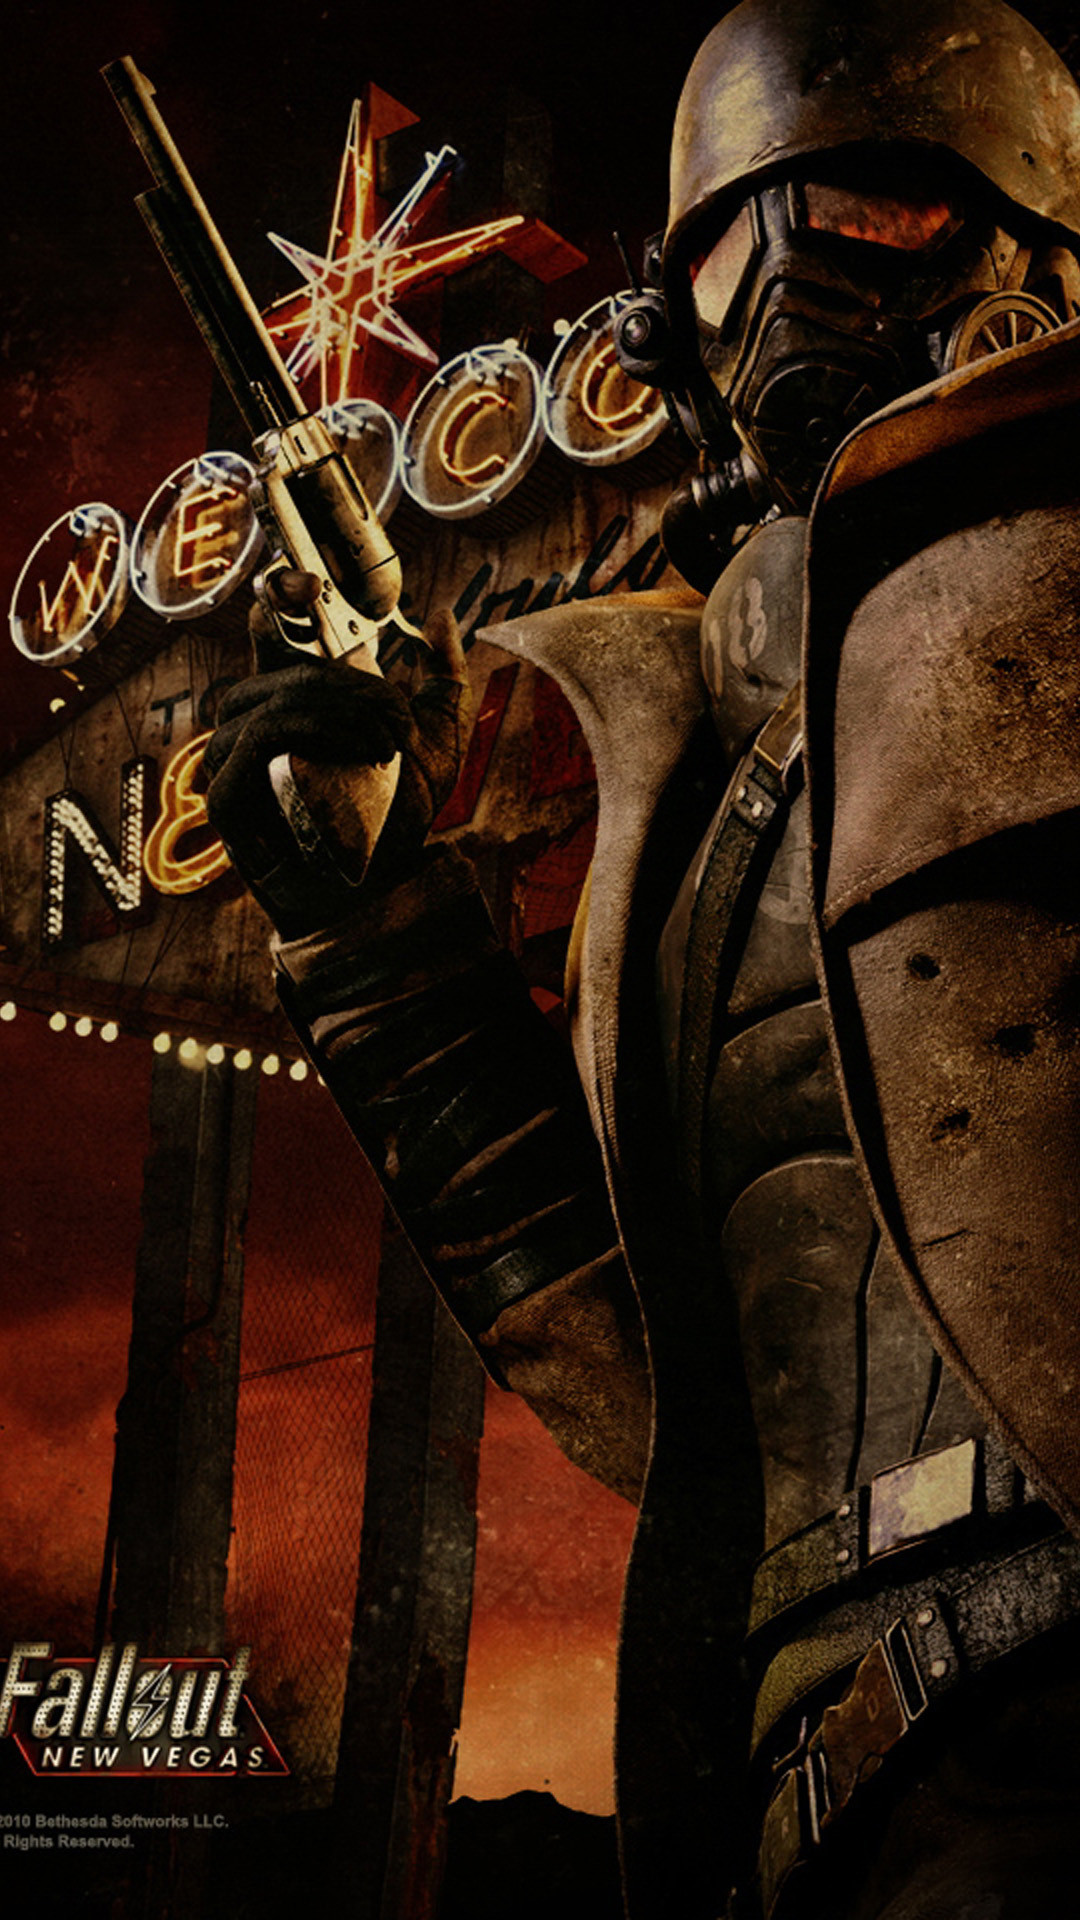 Fallout new vegas Games Galaxy S5 wallpaper